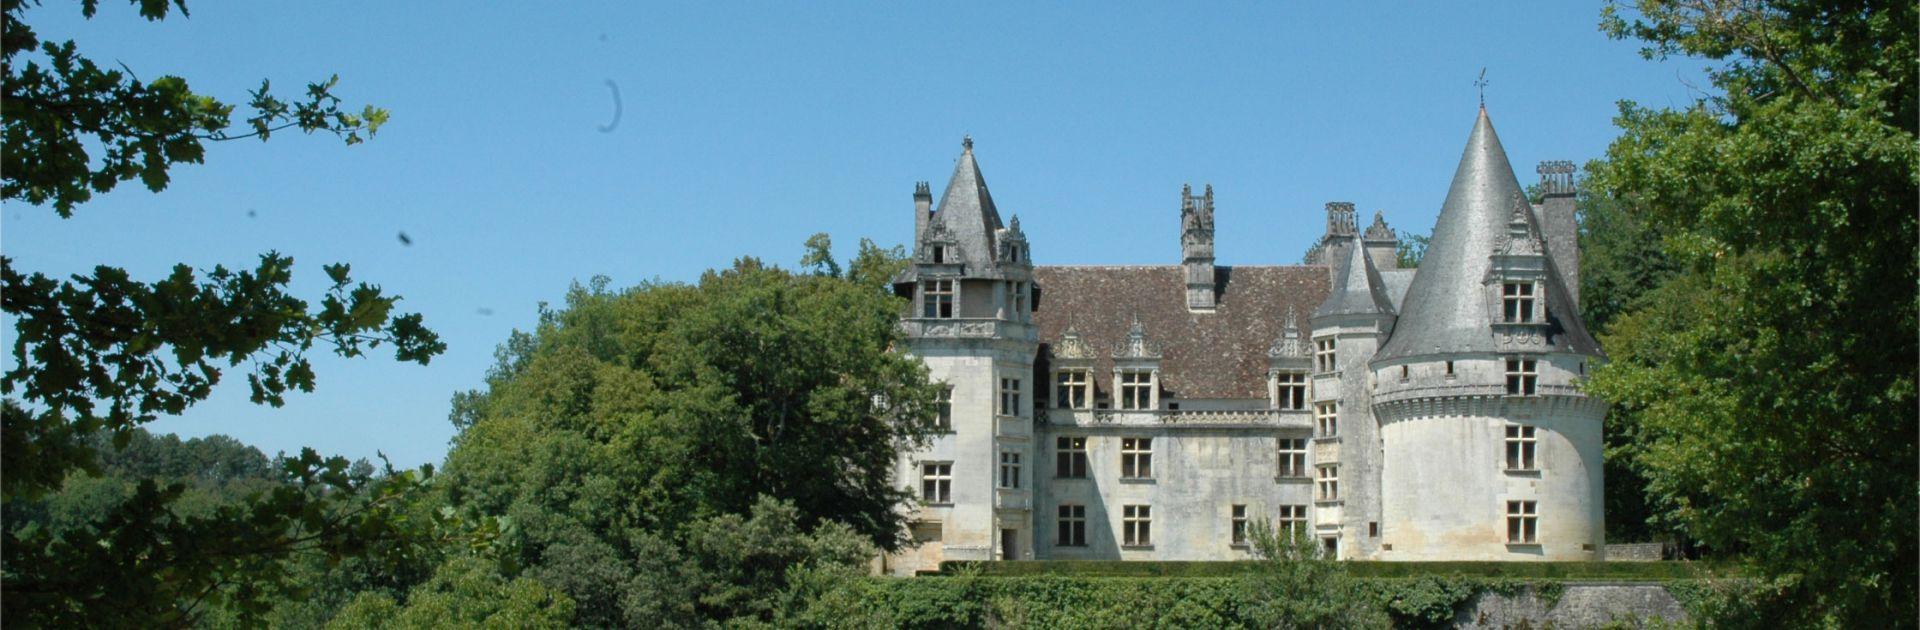 château renaissance périgord vert